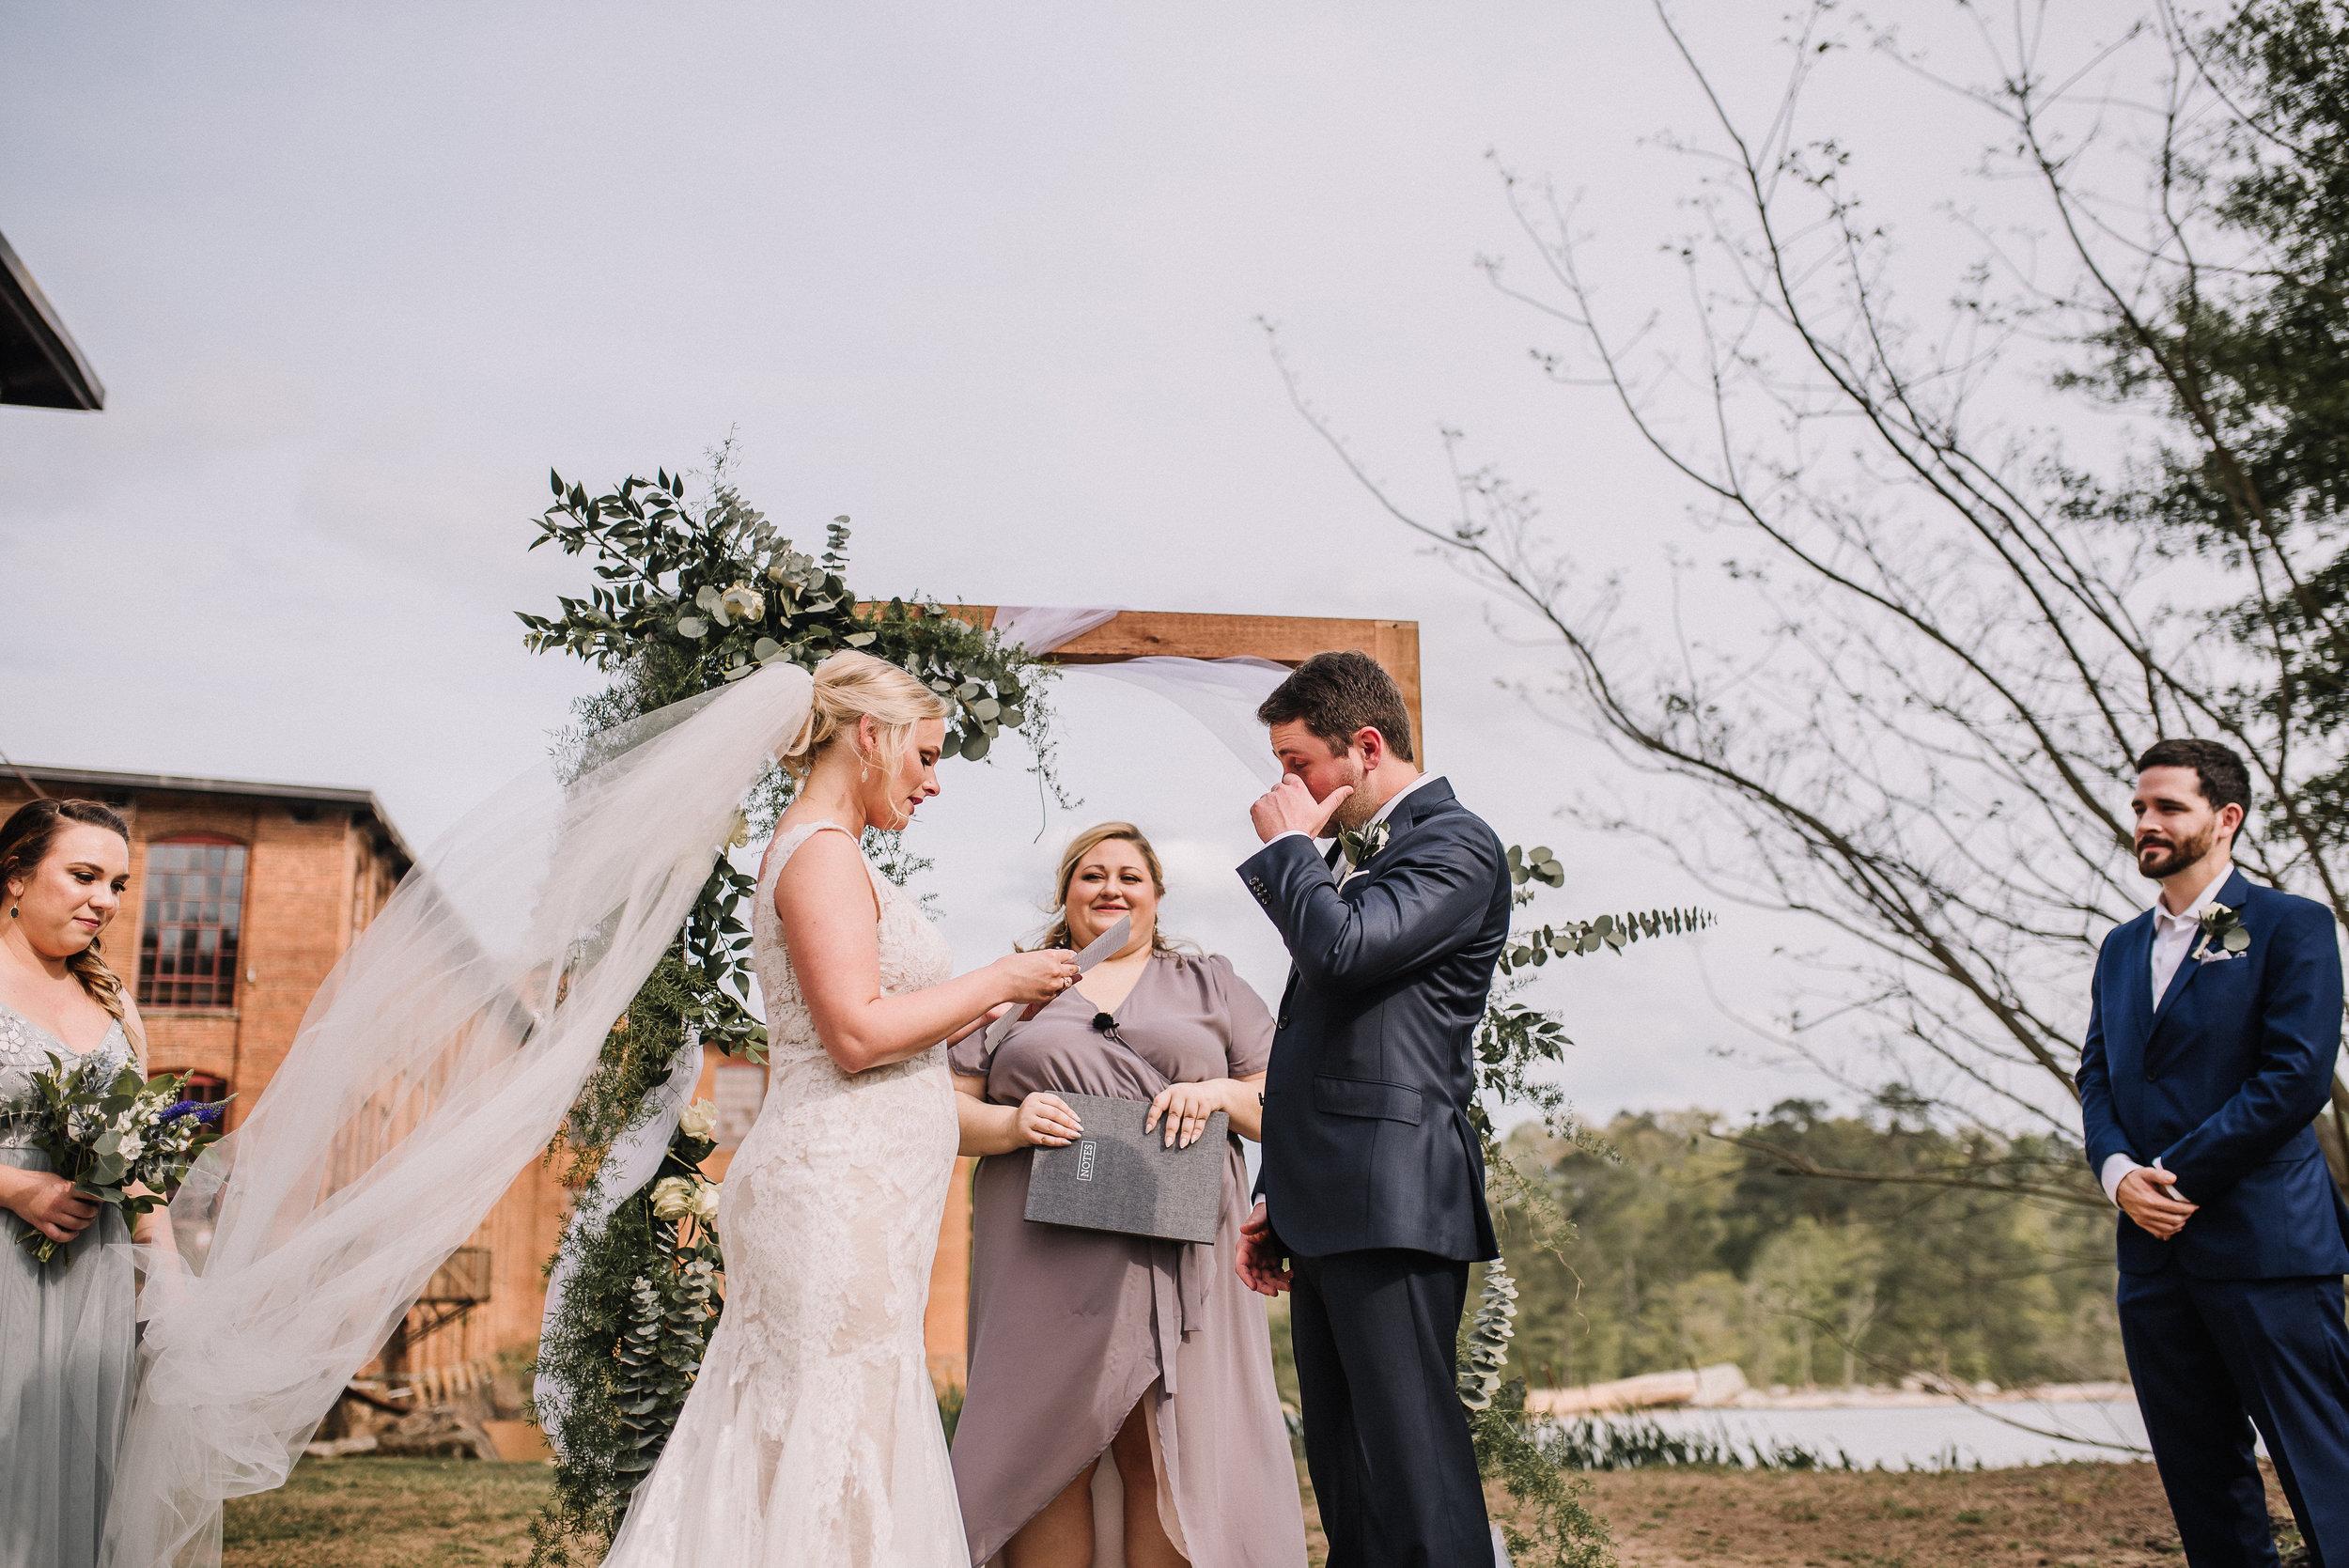 Morgan Wedding_Mill at Yellow River_Ashley Benham Photography-606.jpg